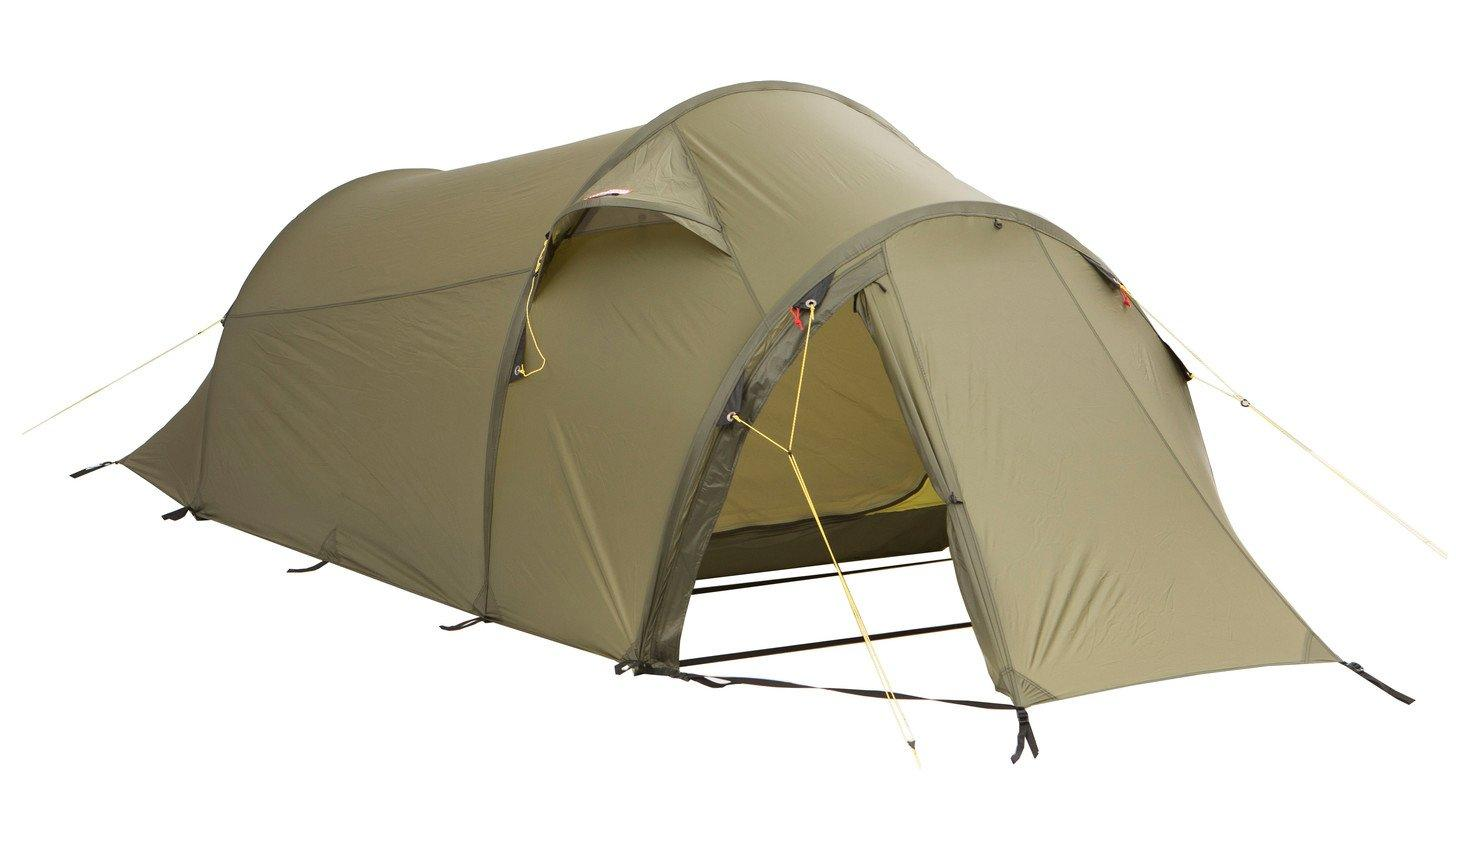 Green Helsport Lofoten Pro 2 C& Tent ...  sc 1 st  Tiso & Berghaus Peak 3.3 Three Person Tent   Tiso